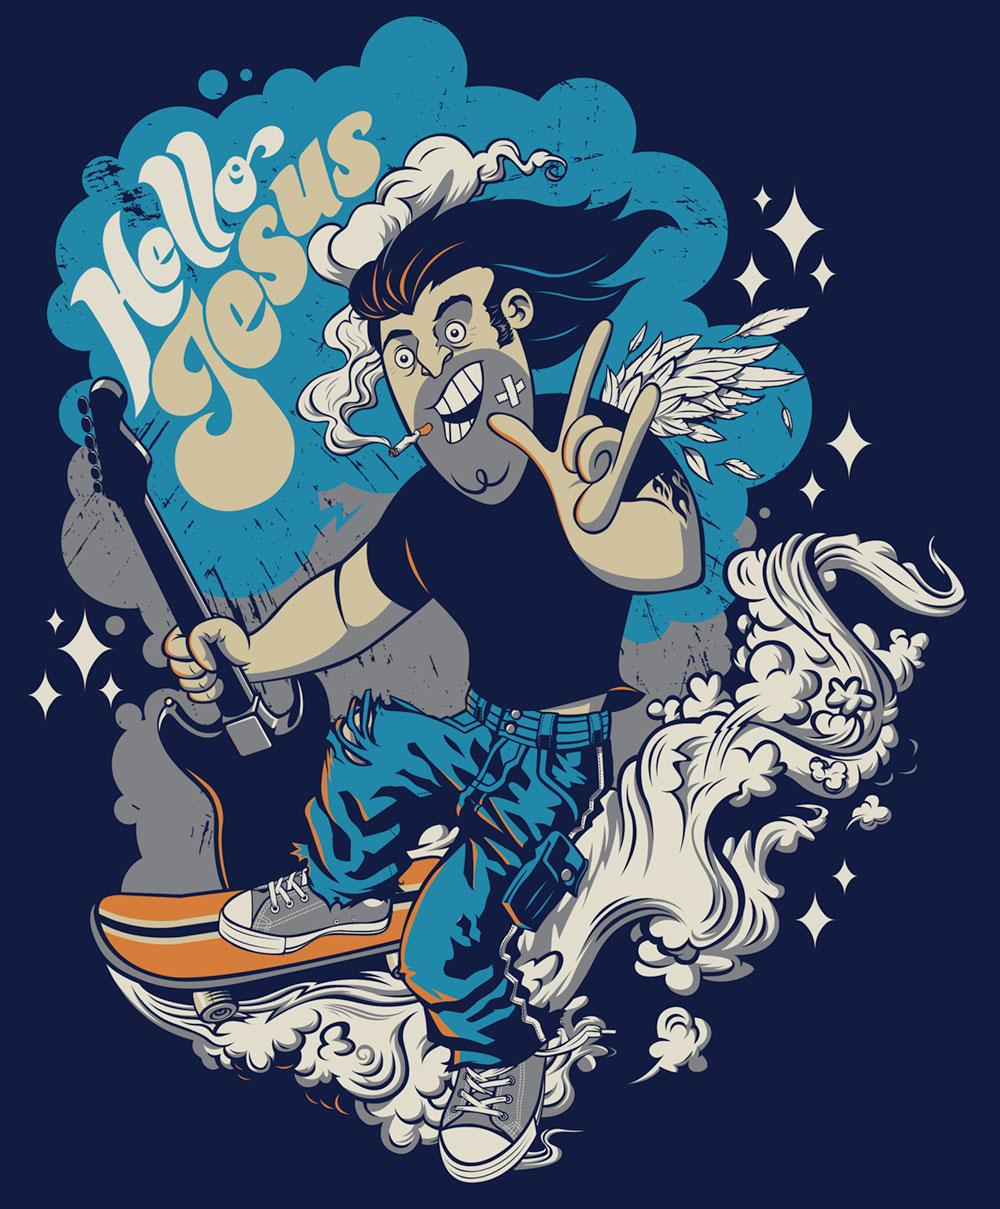 Joselitos Heaven by Rusc